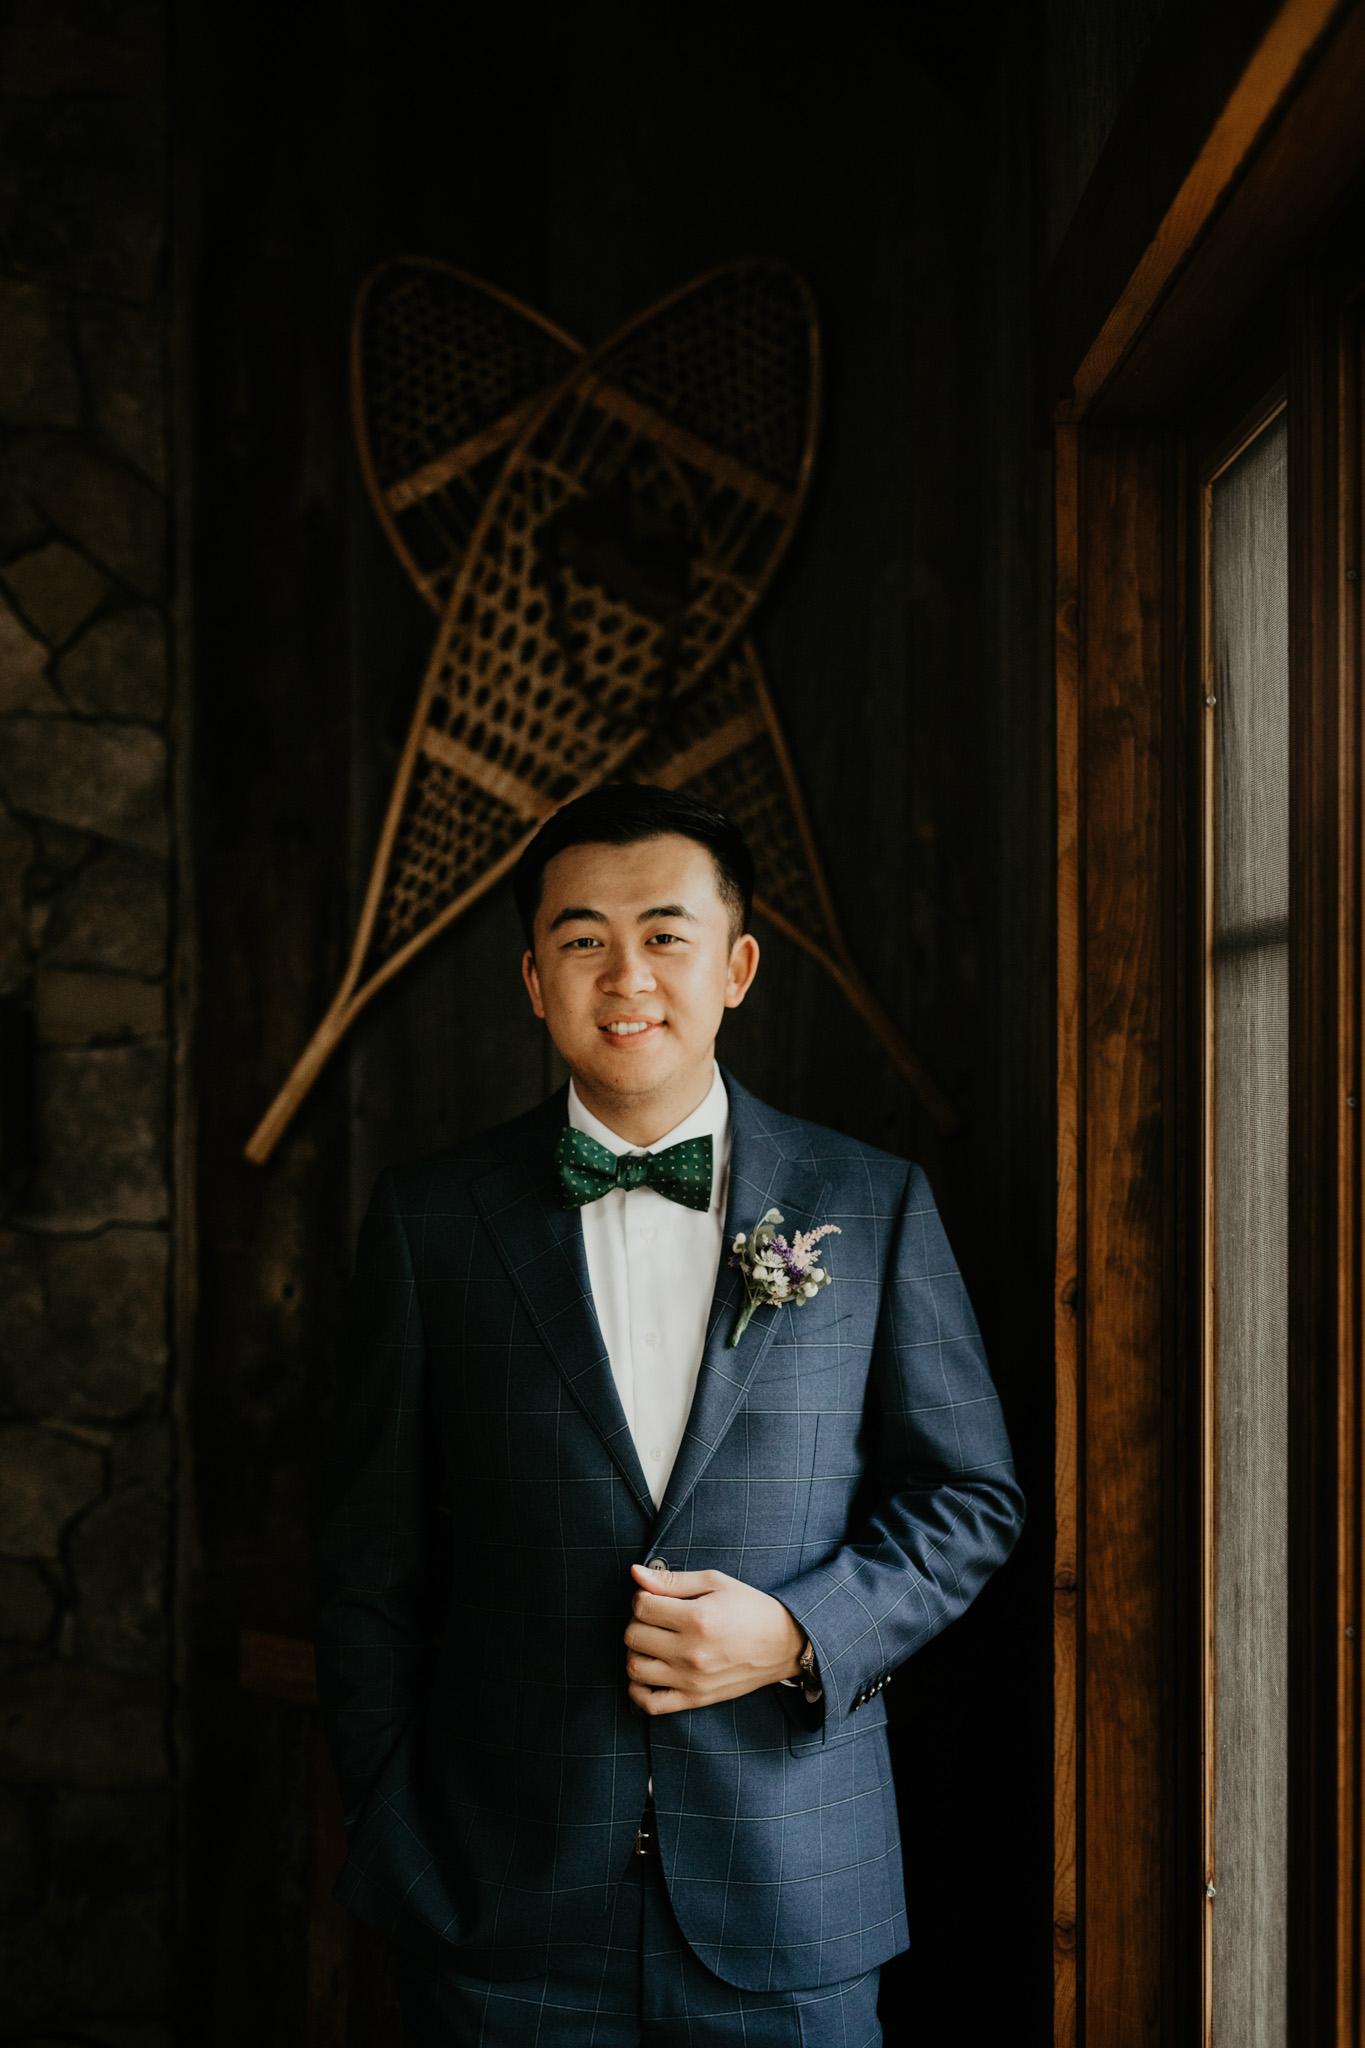 Serenity Cottage Wedding - cottage portrait of groom